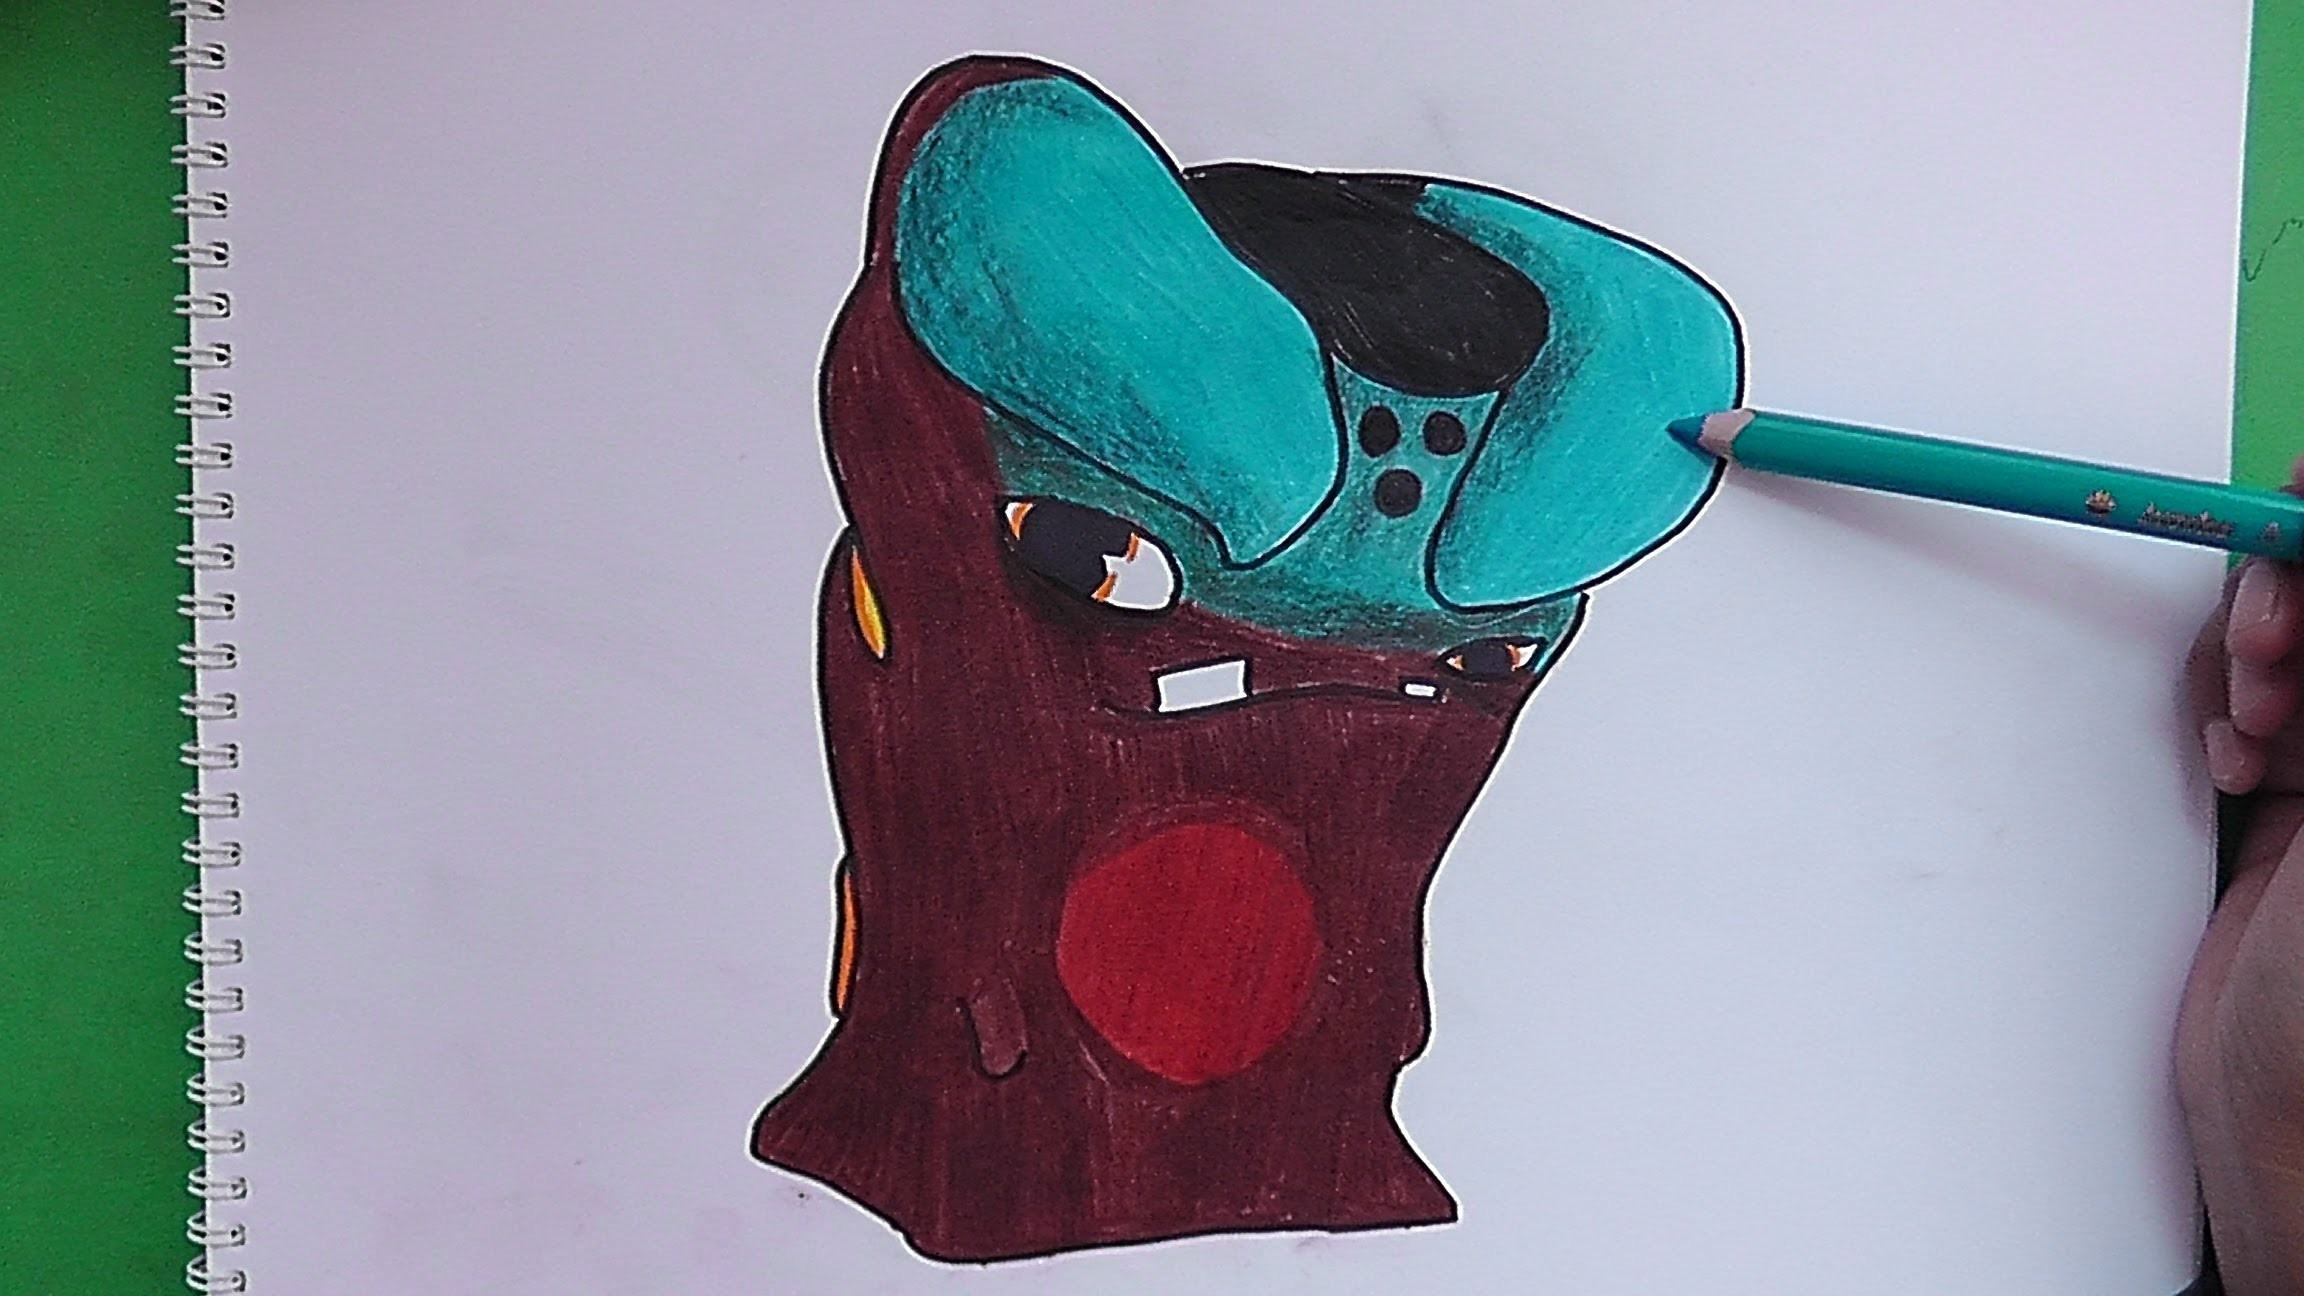 Dibujando Y Pintando A Fraguadora Bajoterra Drawing And Painting